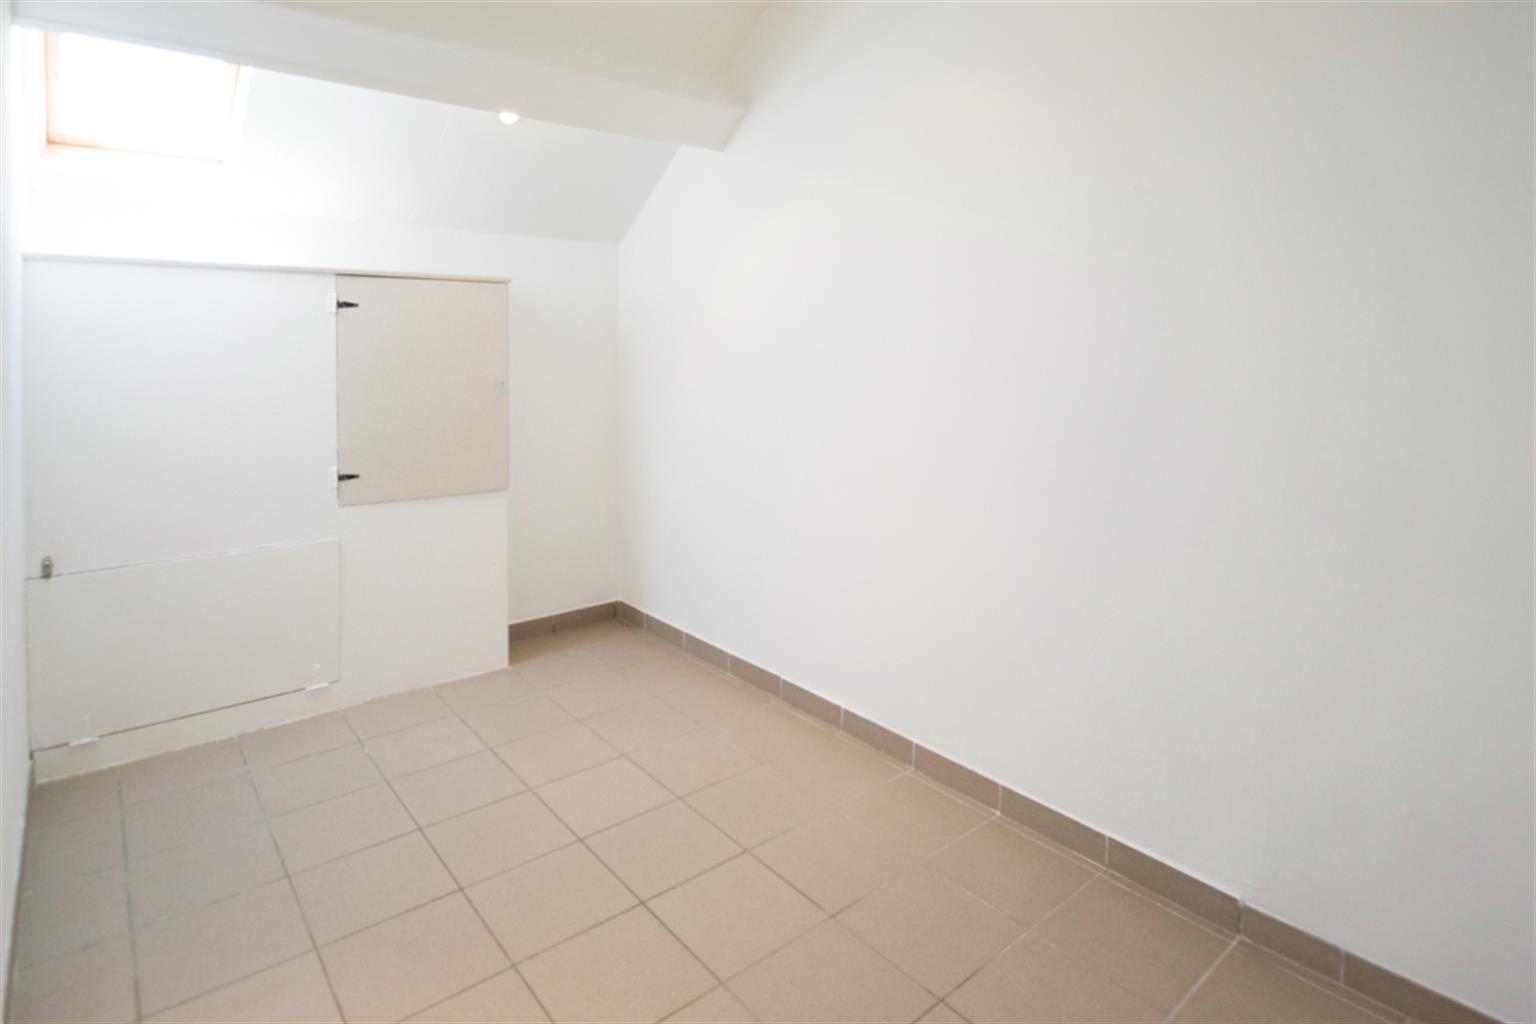 Appartement - Leval-Trahegnies - #3988340-4